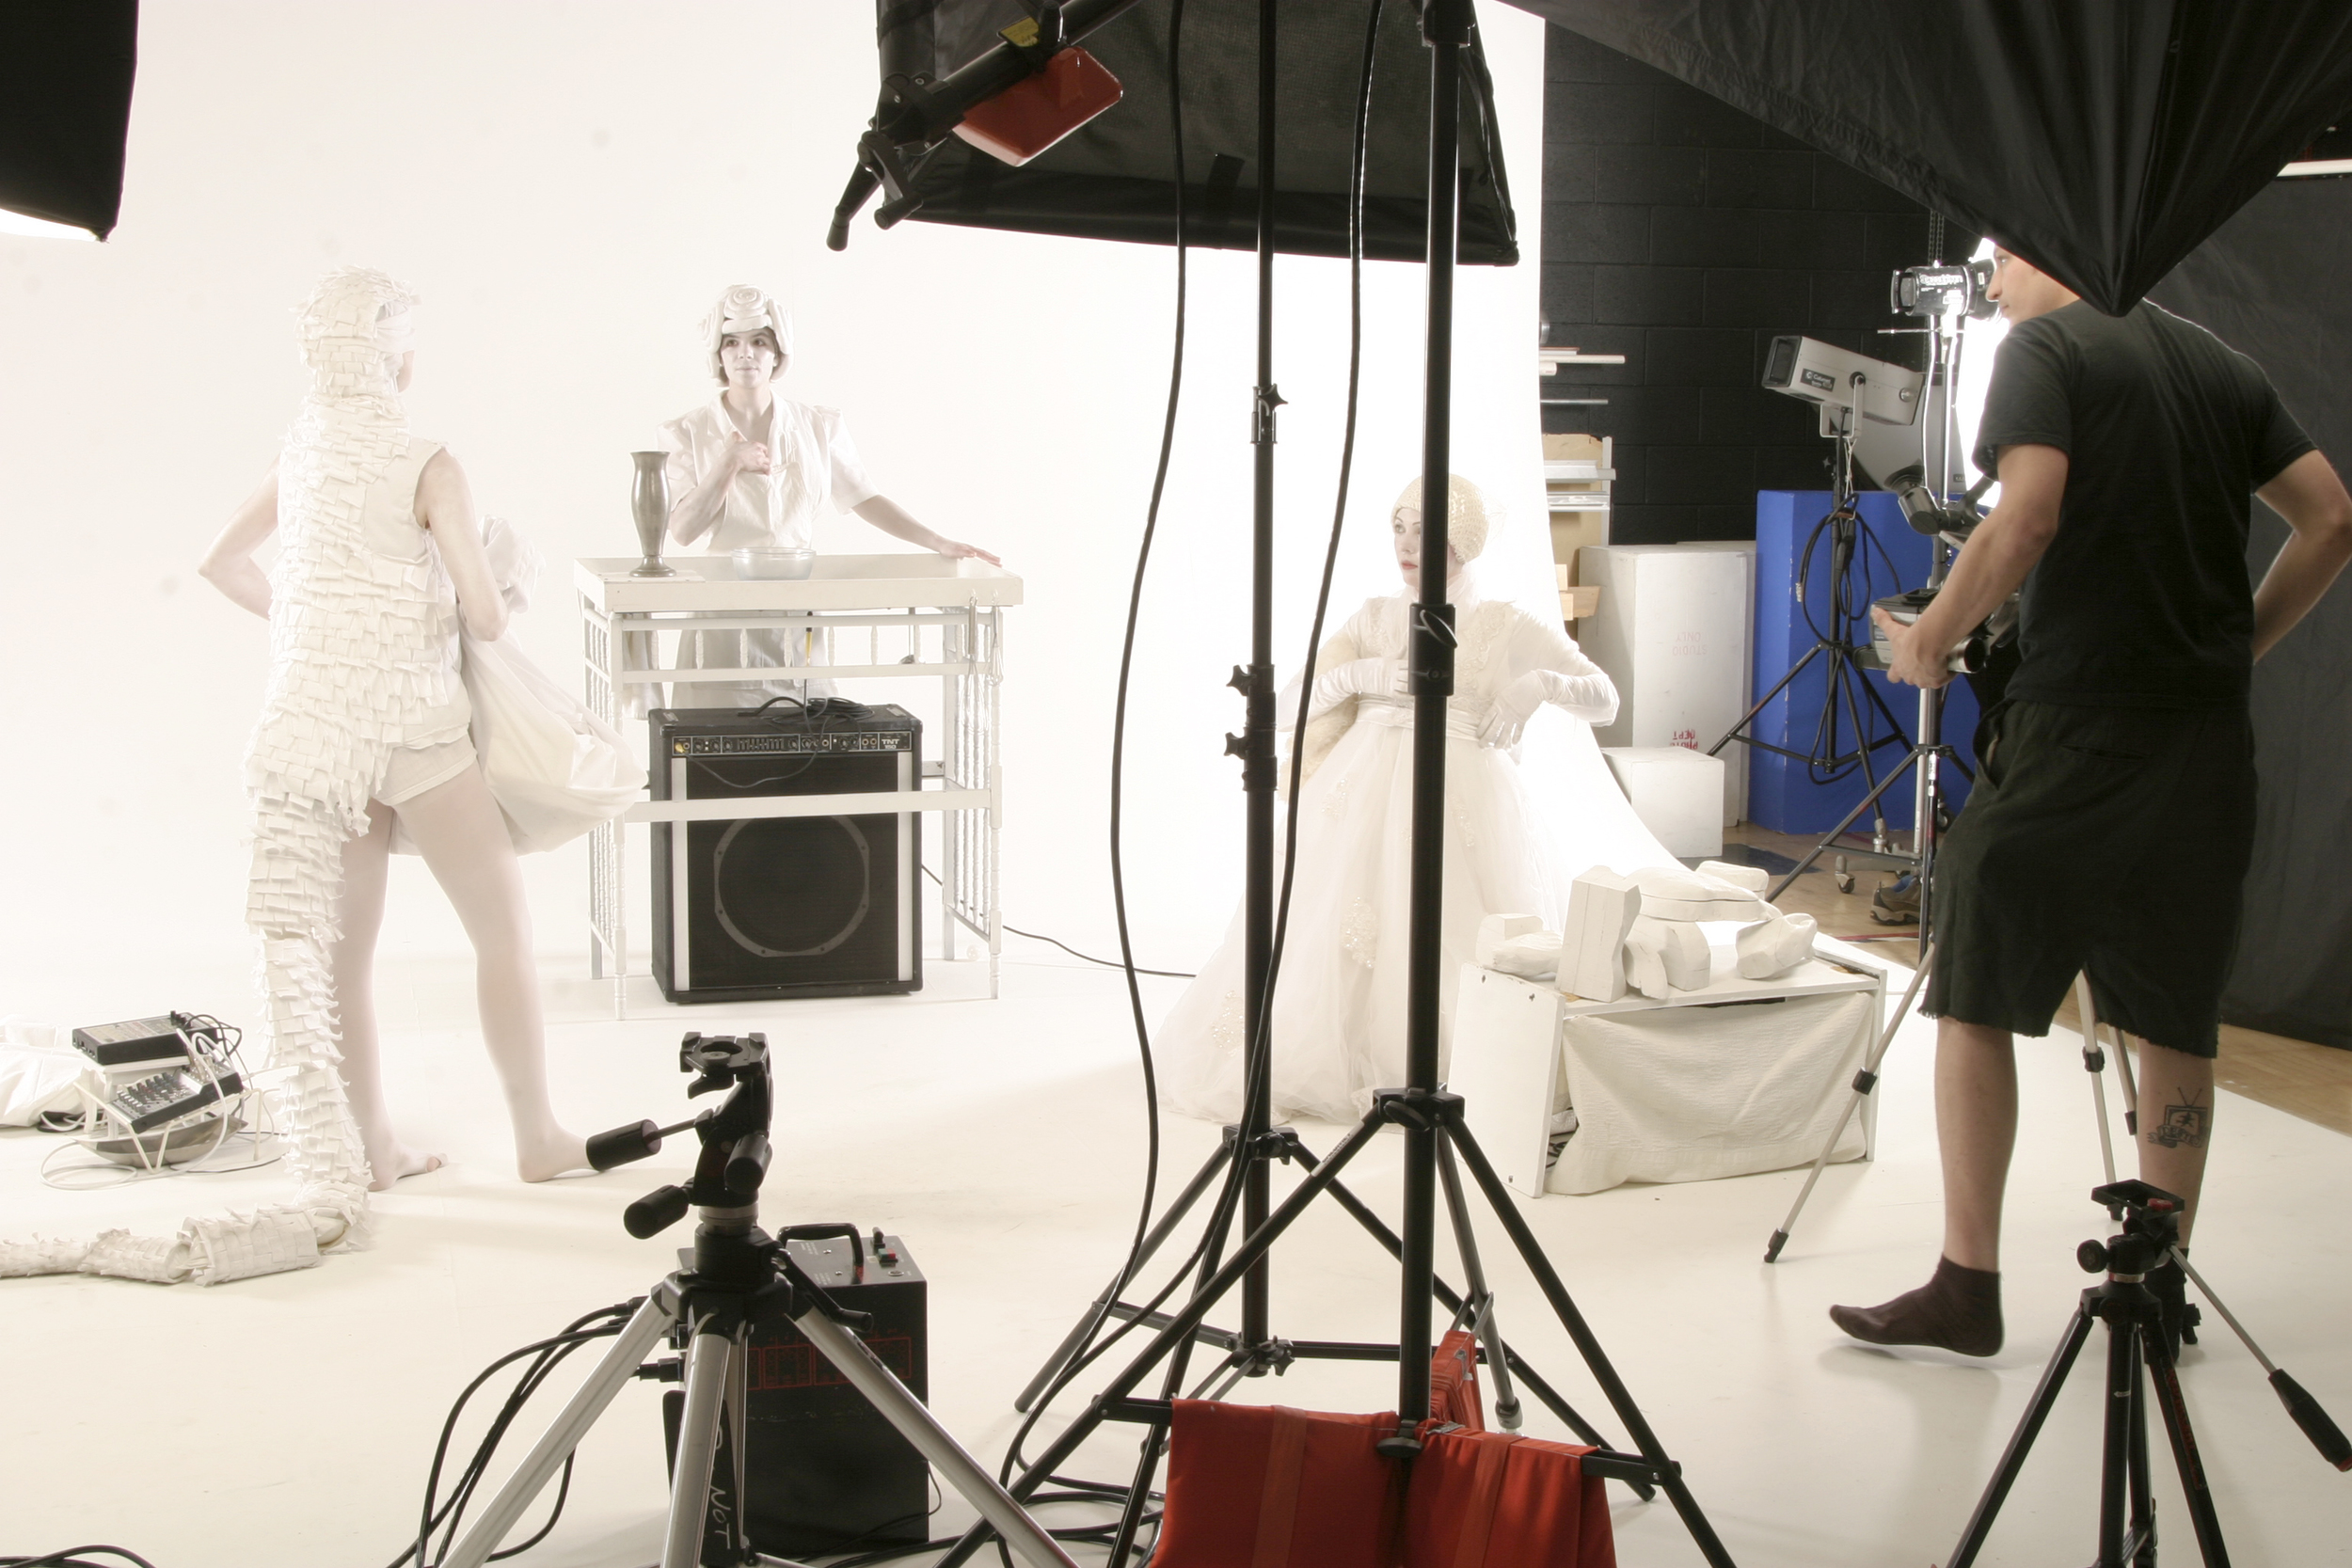 Tina Matthews. Eve Warnock, Gendala Kelli Anna, and  Nathan Ober  shooting a music video.  Photo by  Aaron Geiser .